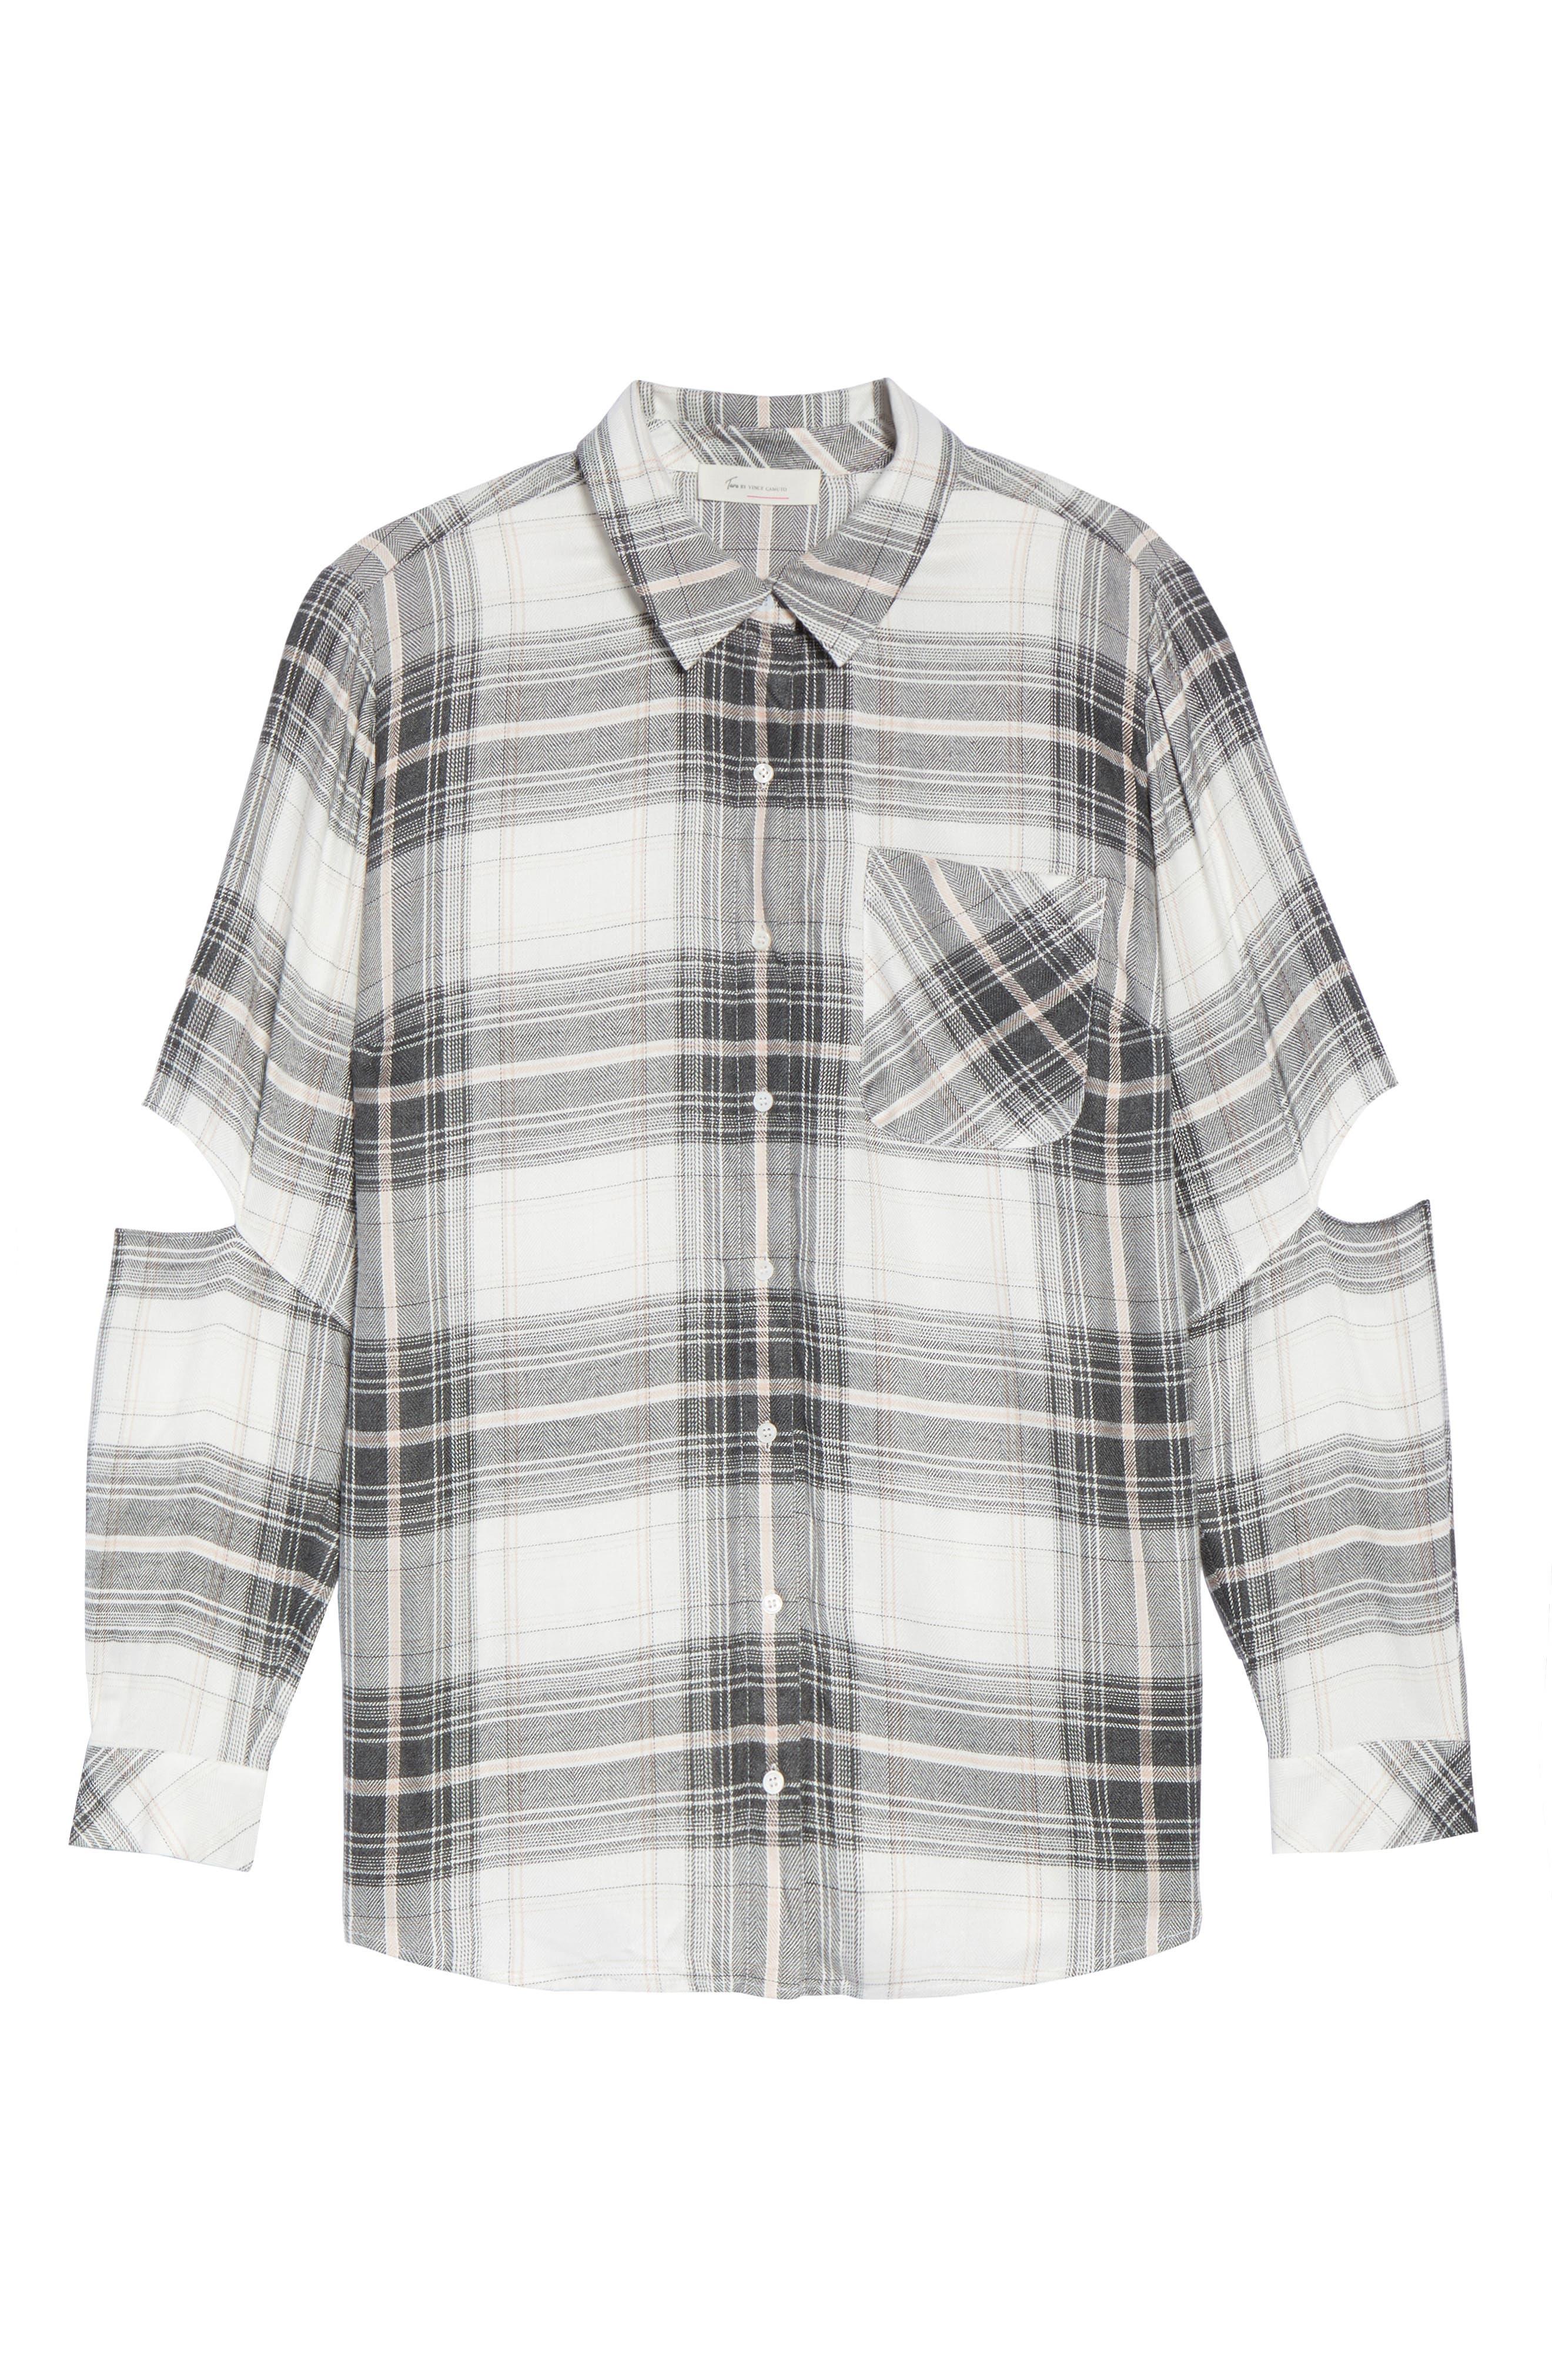 Cold Elbow Linearscape Plaid Shirt,                             Alternate thumbnail 6, color,                             669